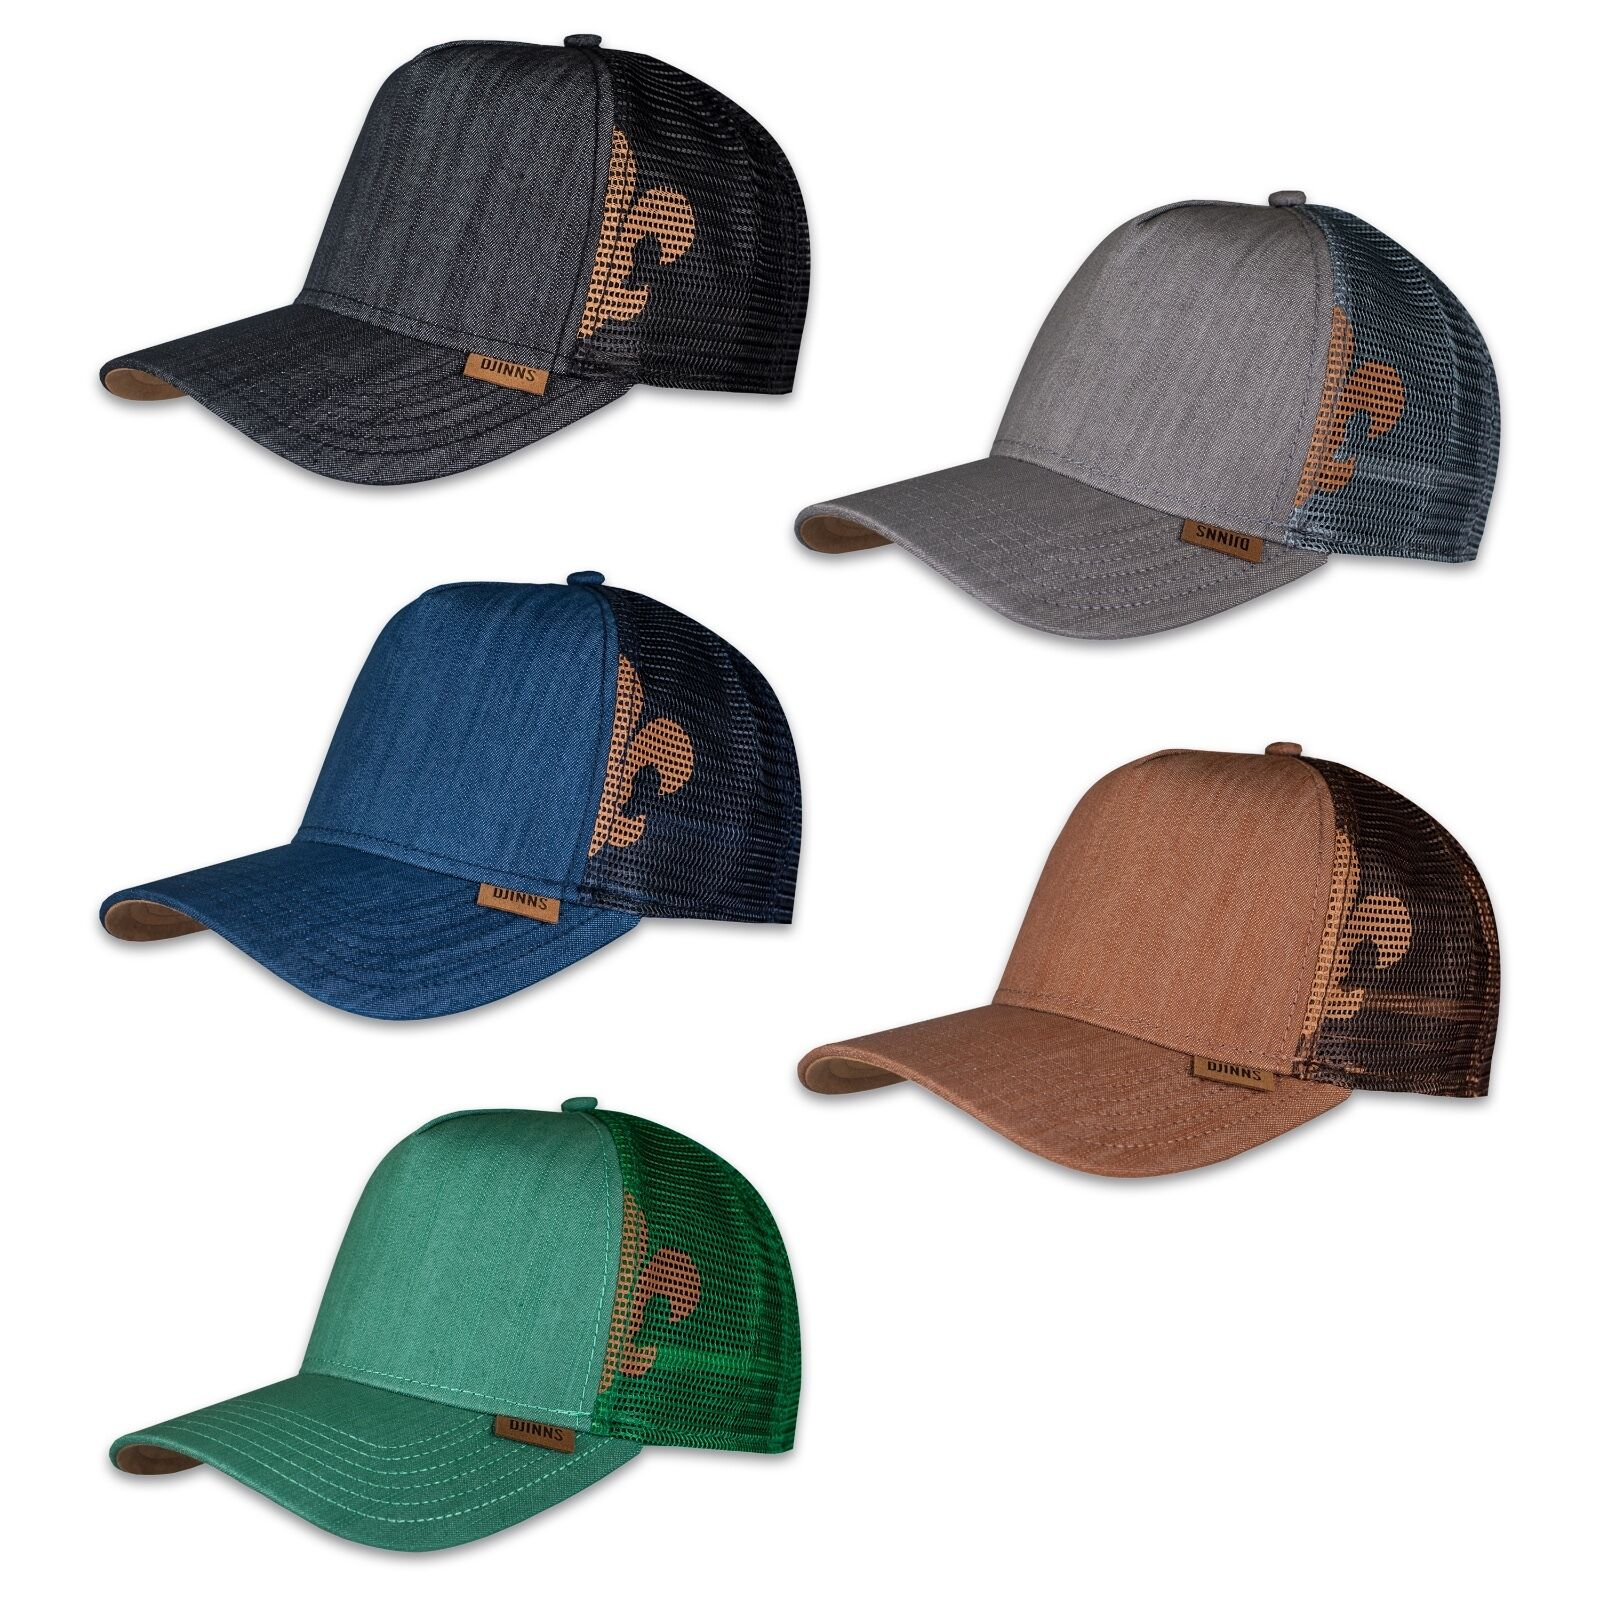 Djinns Linen 2014 Trucker Cap Mesh Hat Cap MESHCAP Black Blue Grey Green